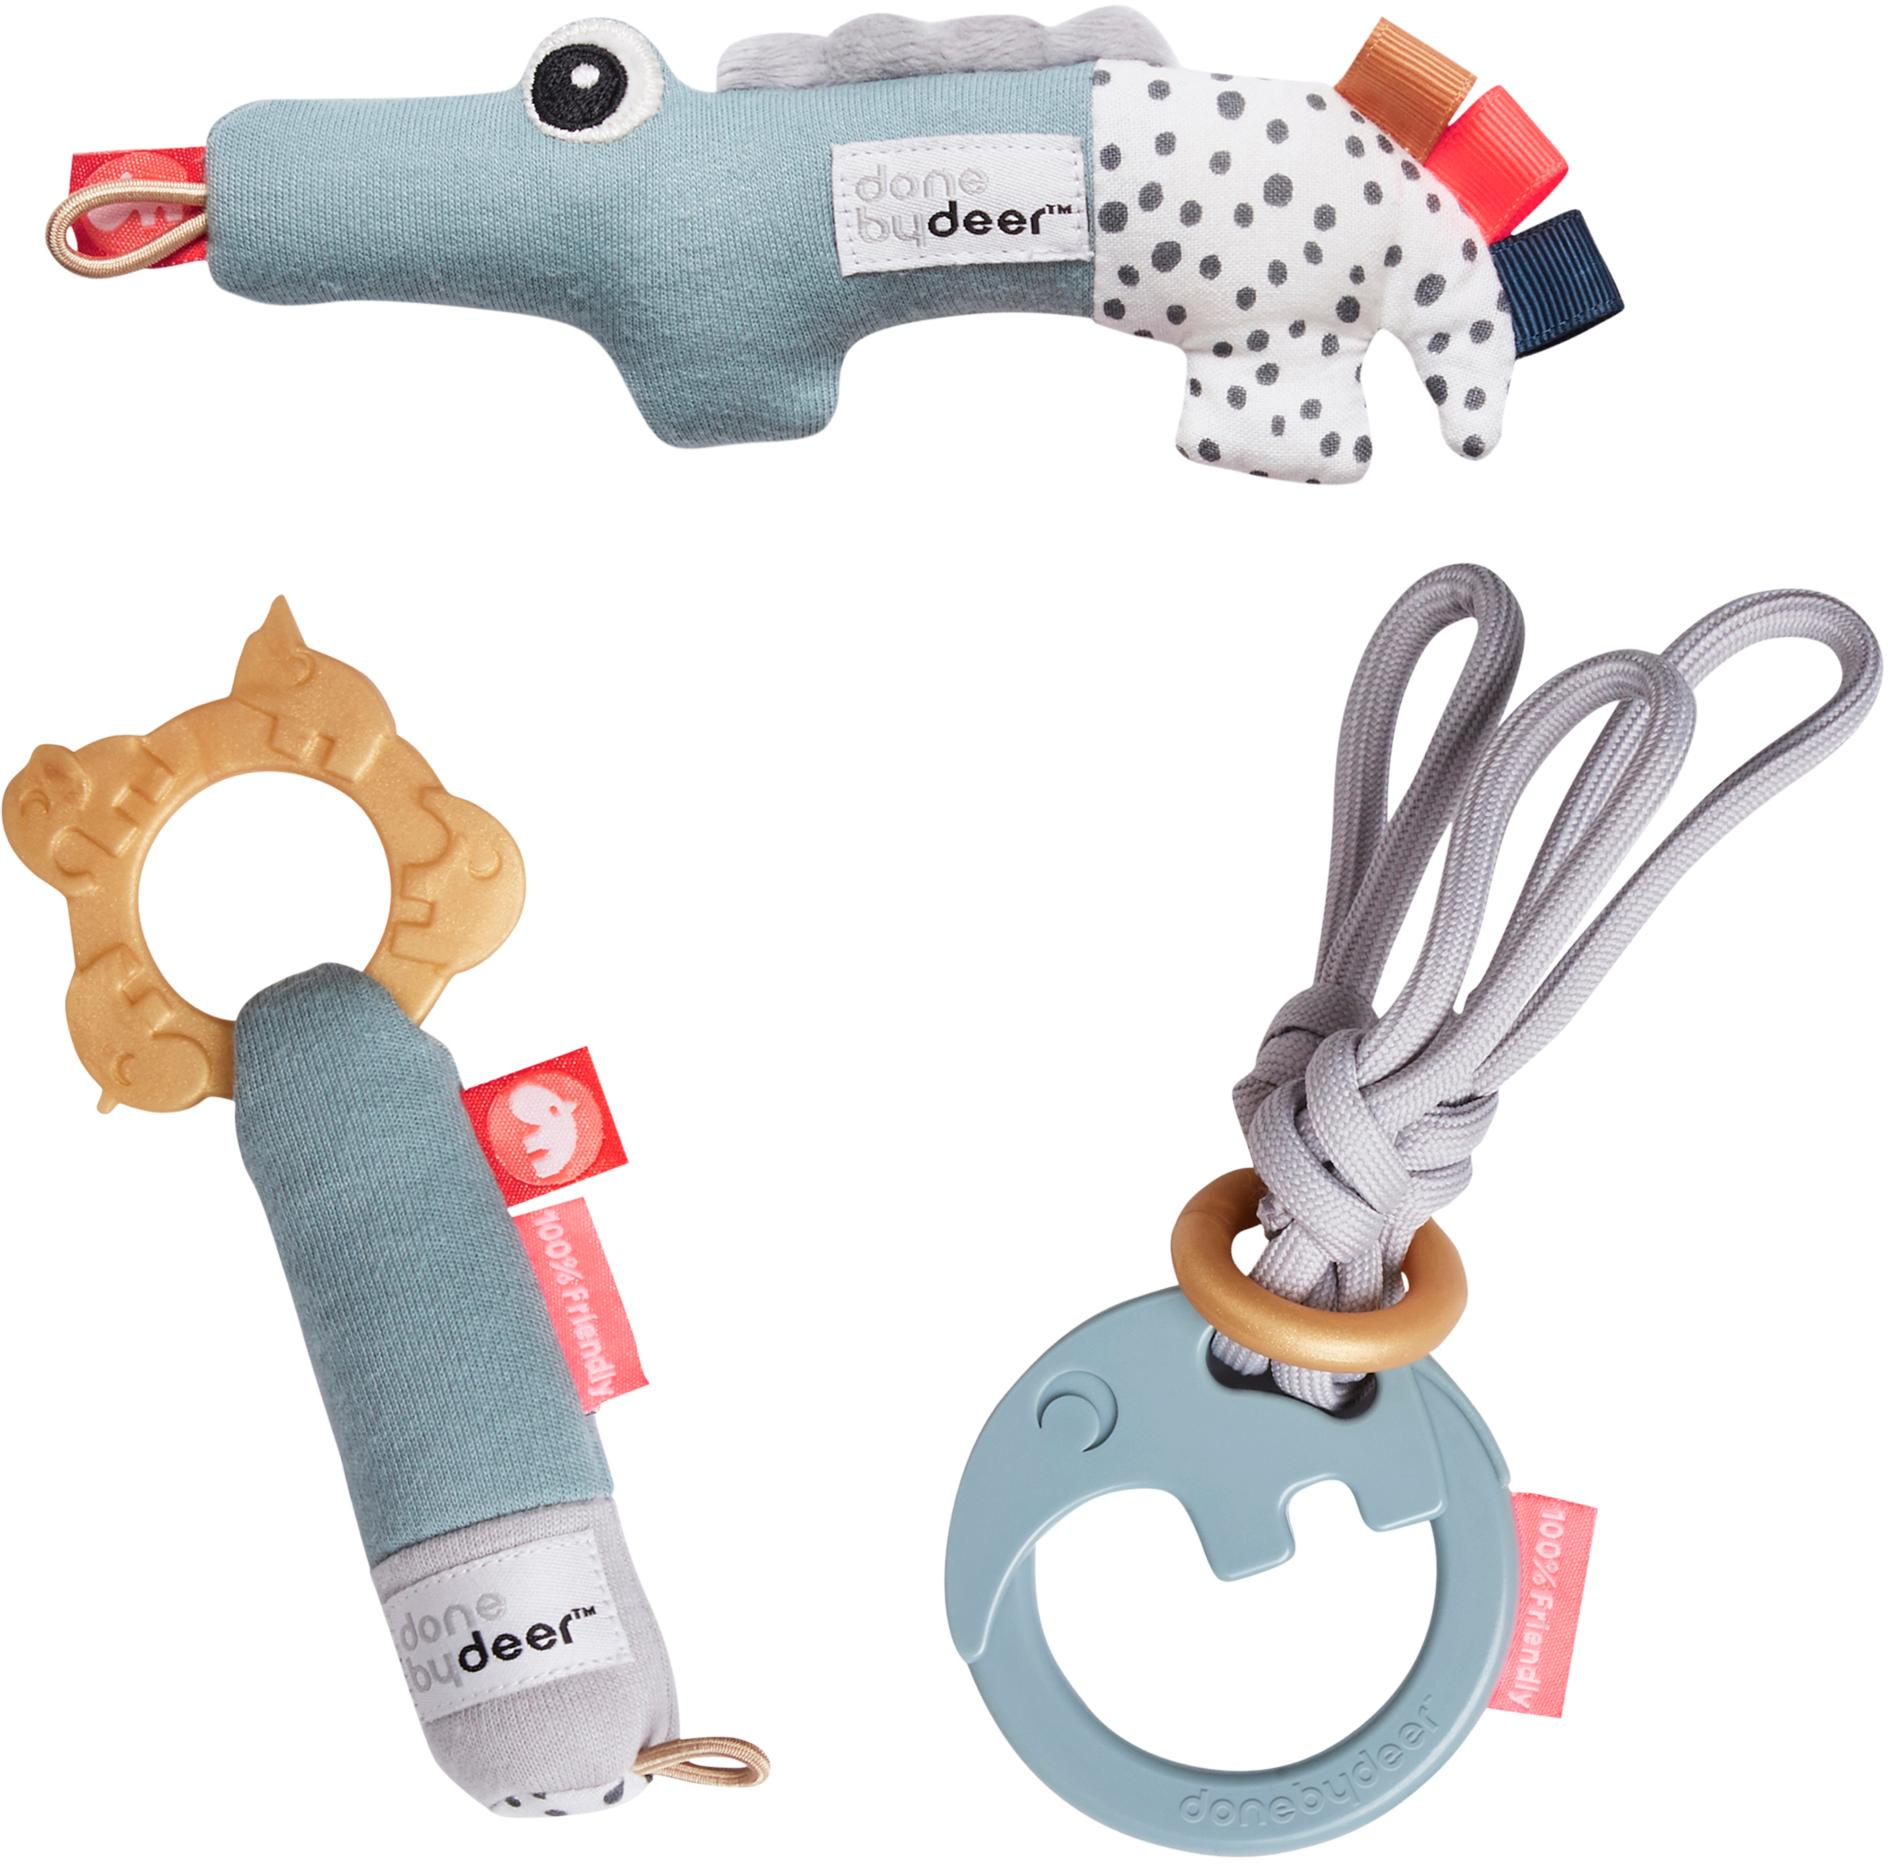 Komplet zabawek Deer Friends, 3 elem., Tapicerka: 100% bawełna, Tapicerka: 100% bawełna, Wielobarwny, Komplet z różnymi rozmiarami